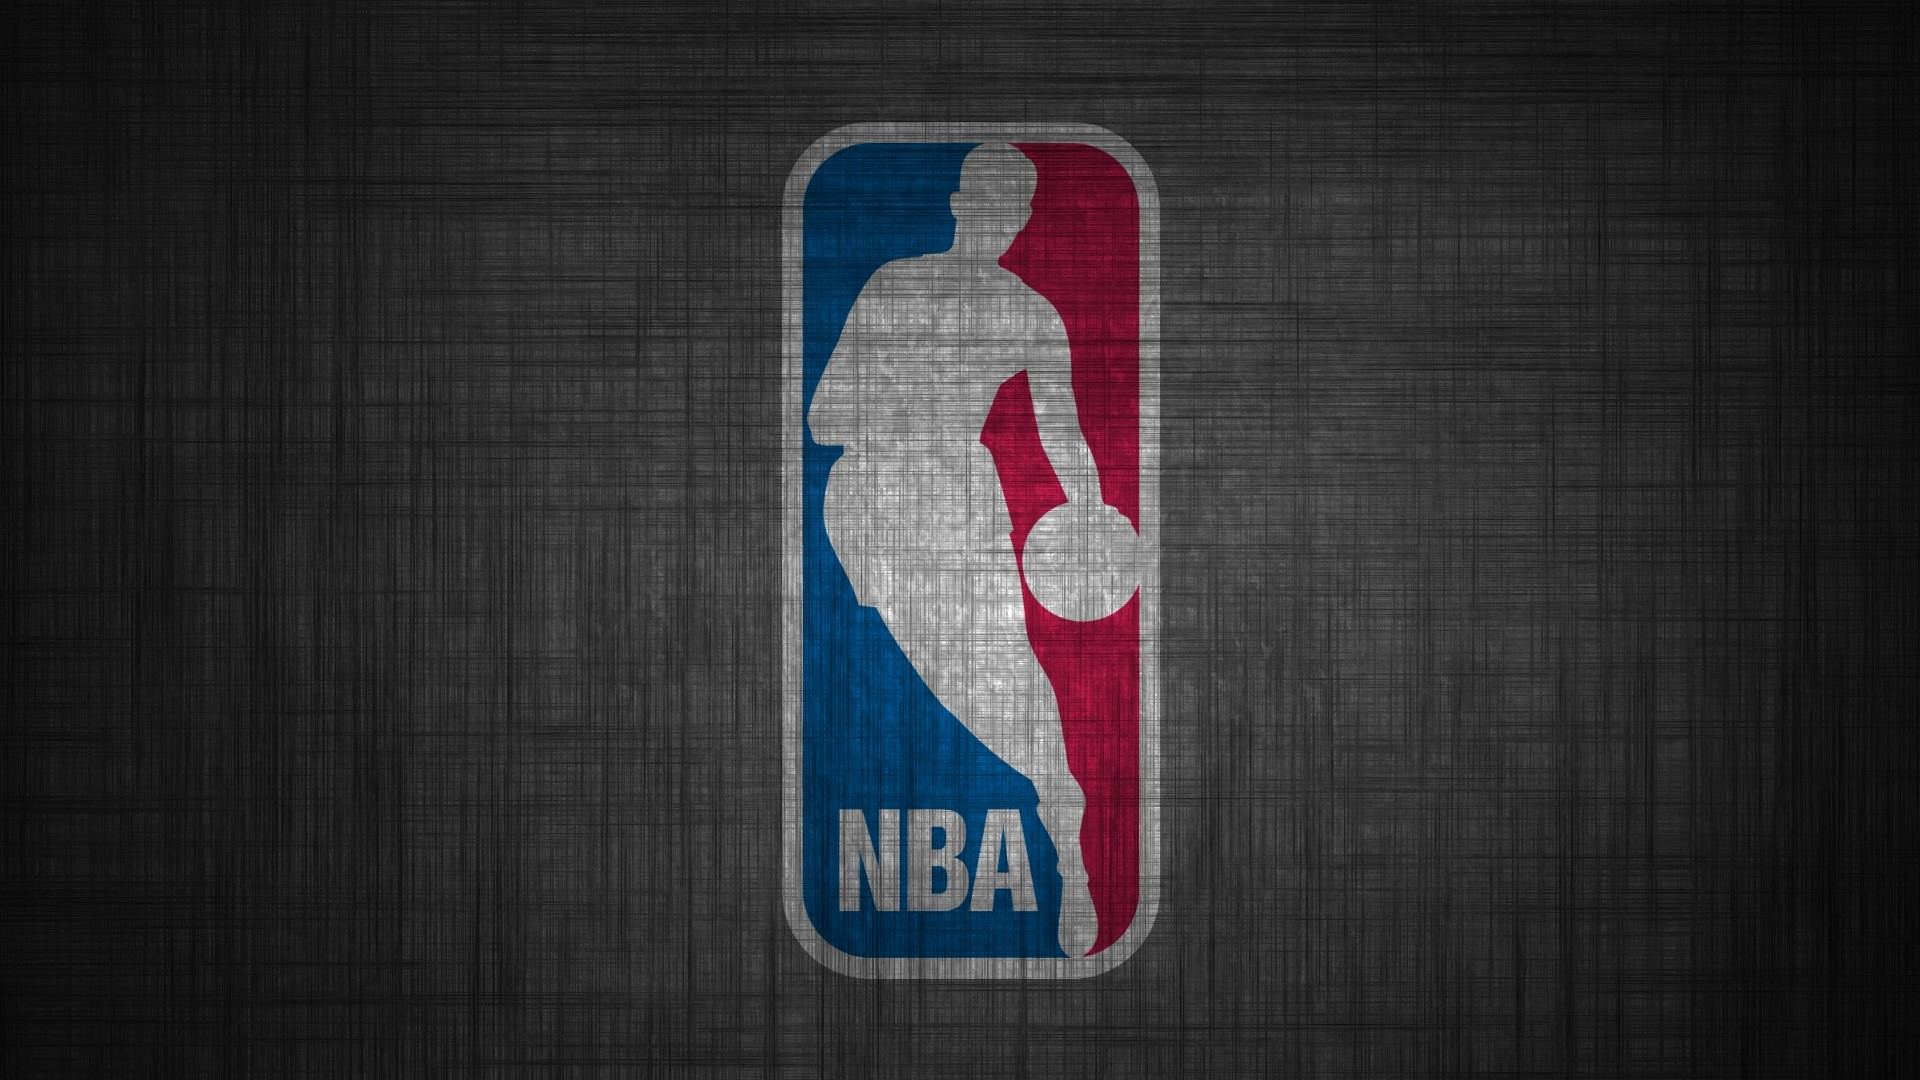 wallpapers sports nba wallpaper professional basketball logo wallpaper .